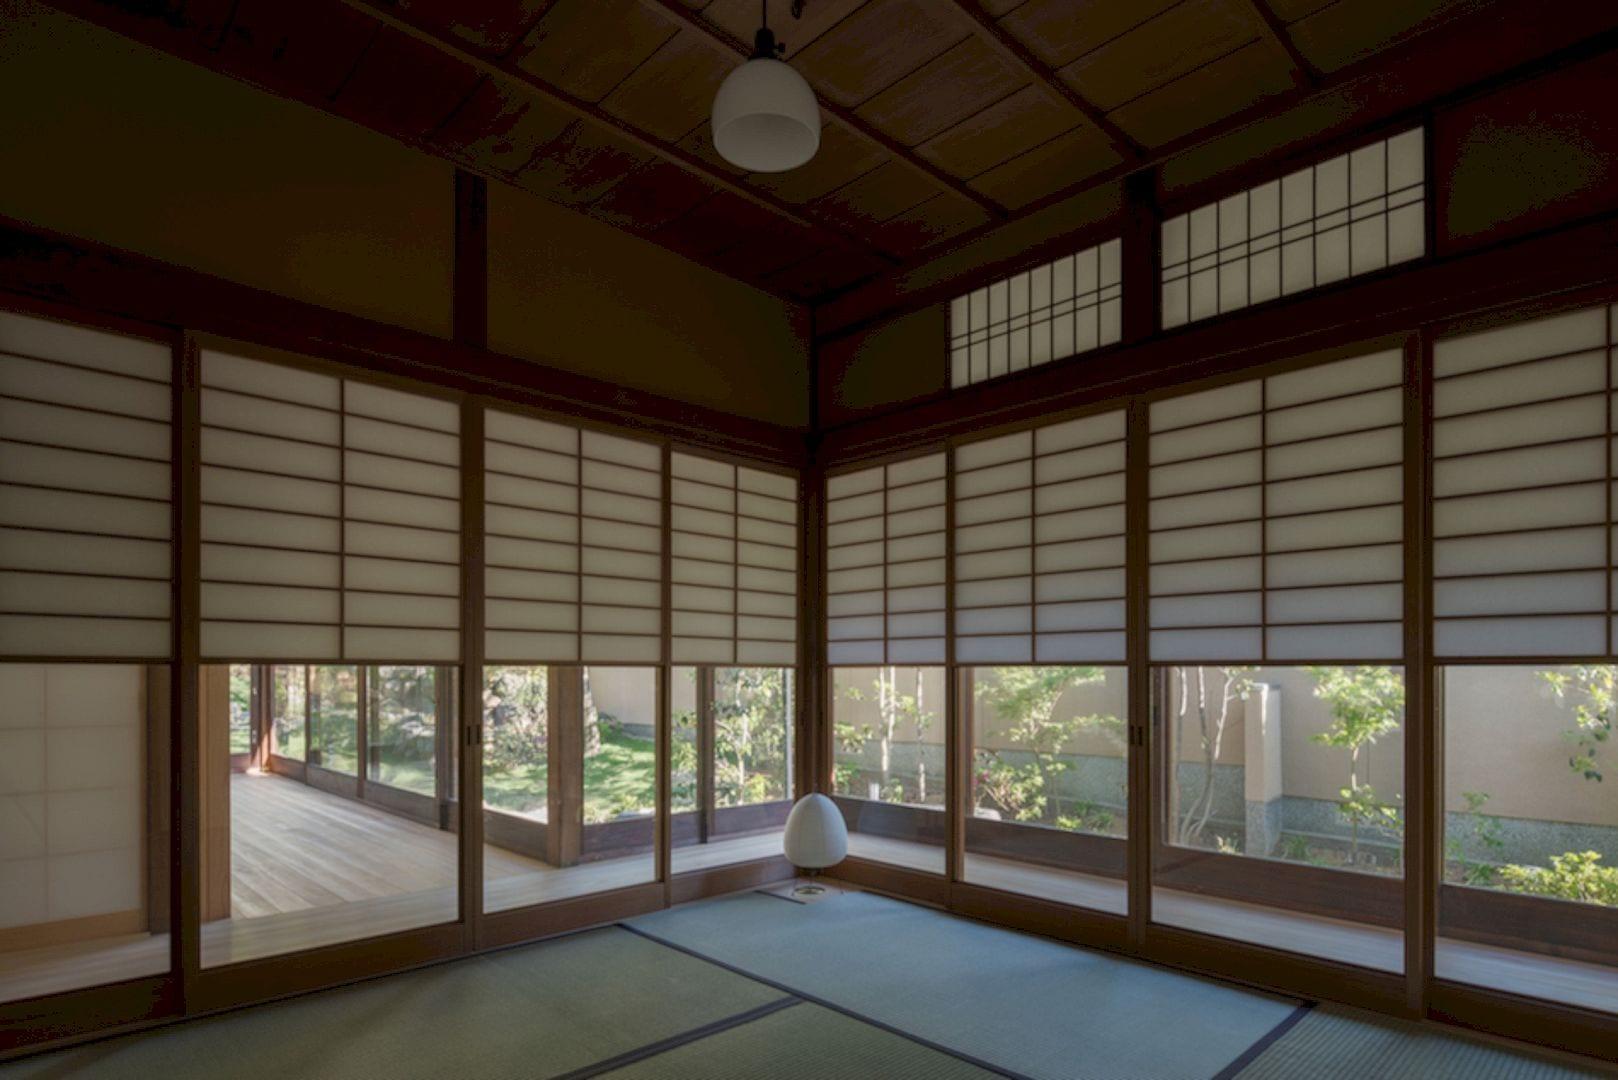 House In Shishigatani By Kazuya Morita Architecture Studio 6